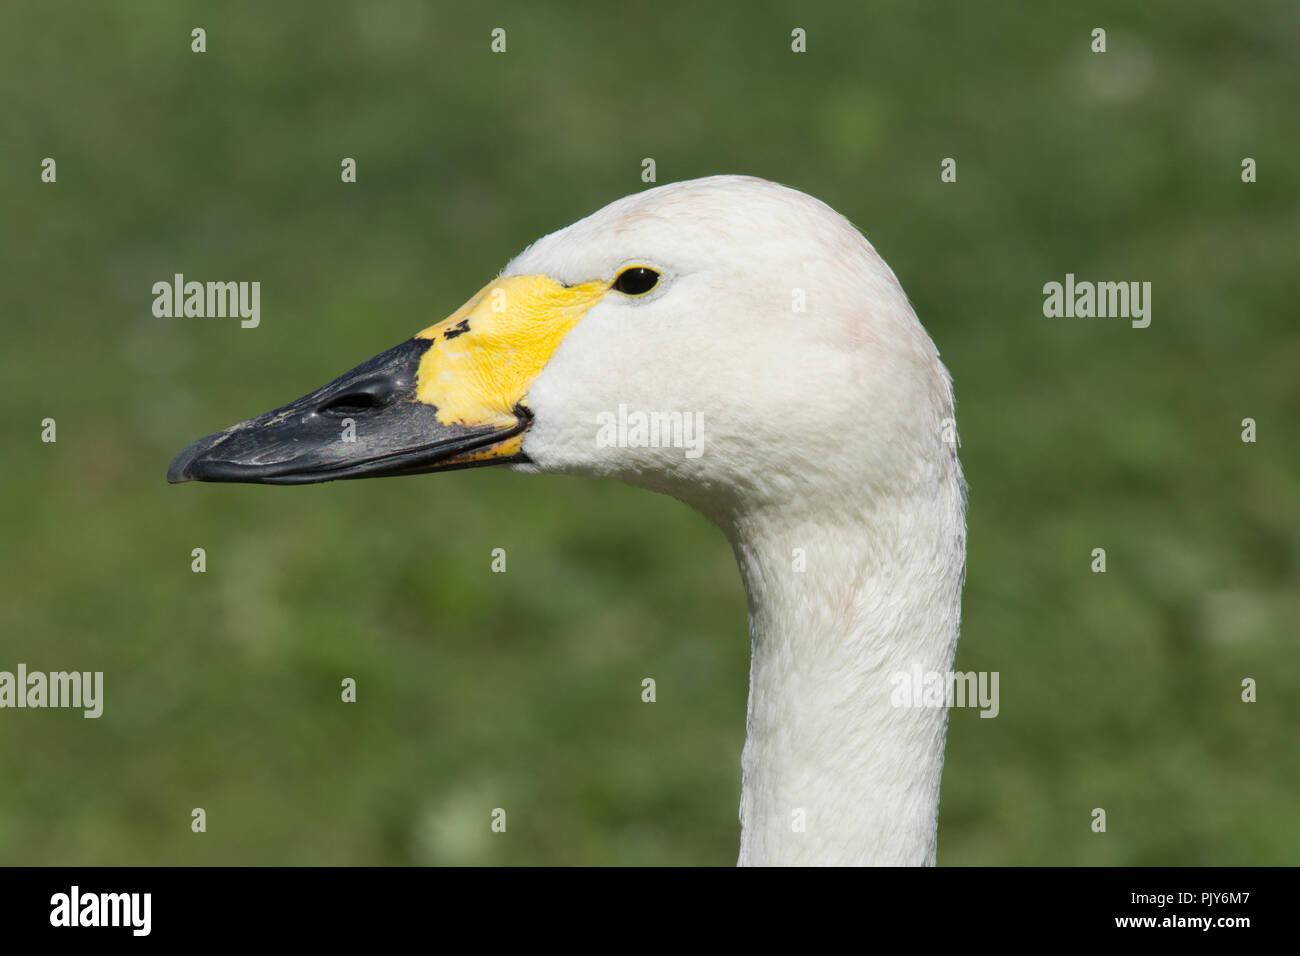 Bewick's swan (Cygnus columbianus bewickii) - Stock Image